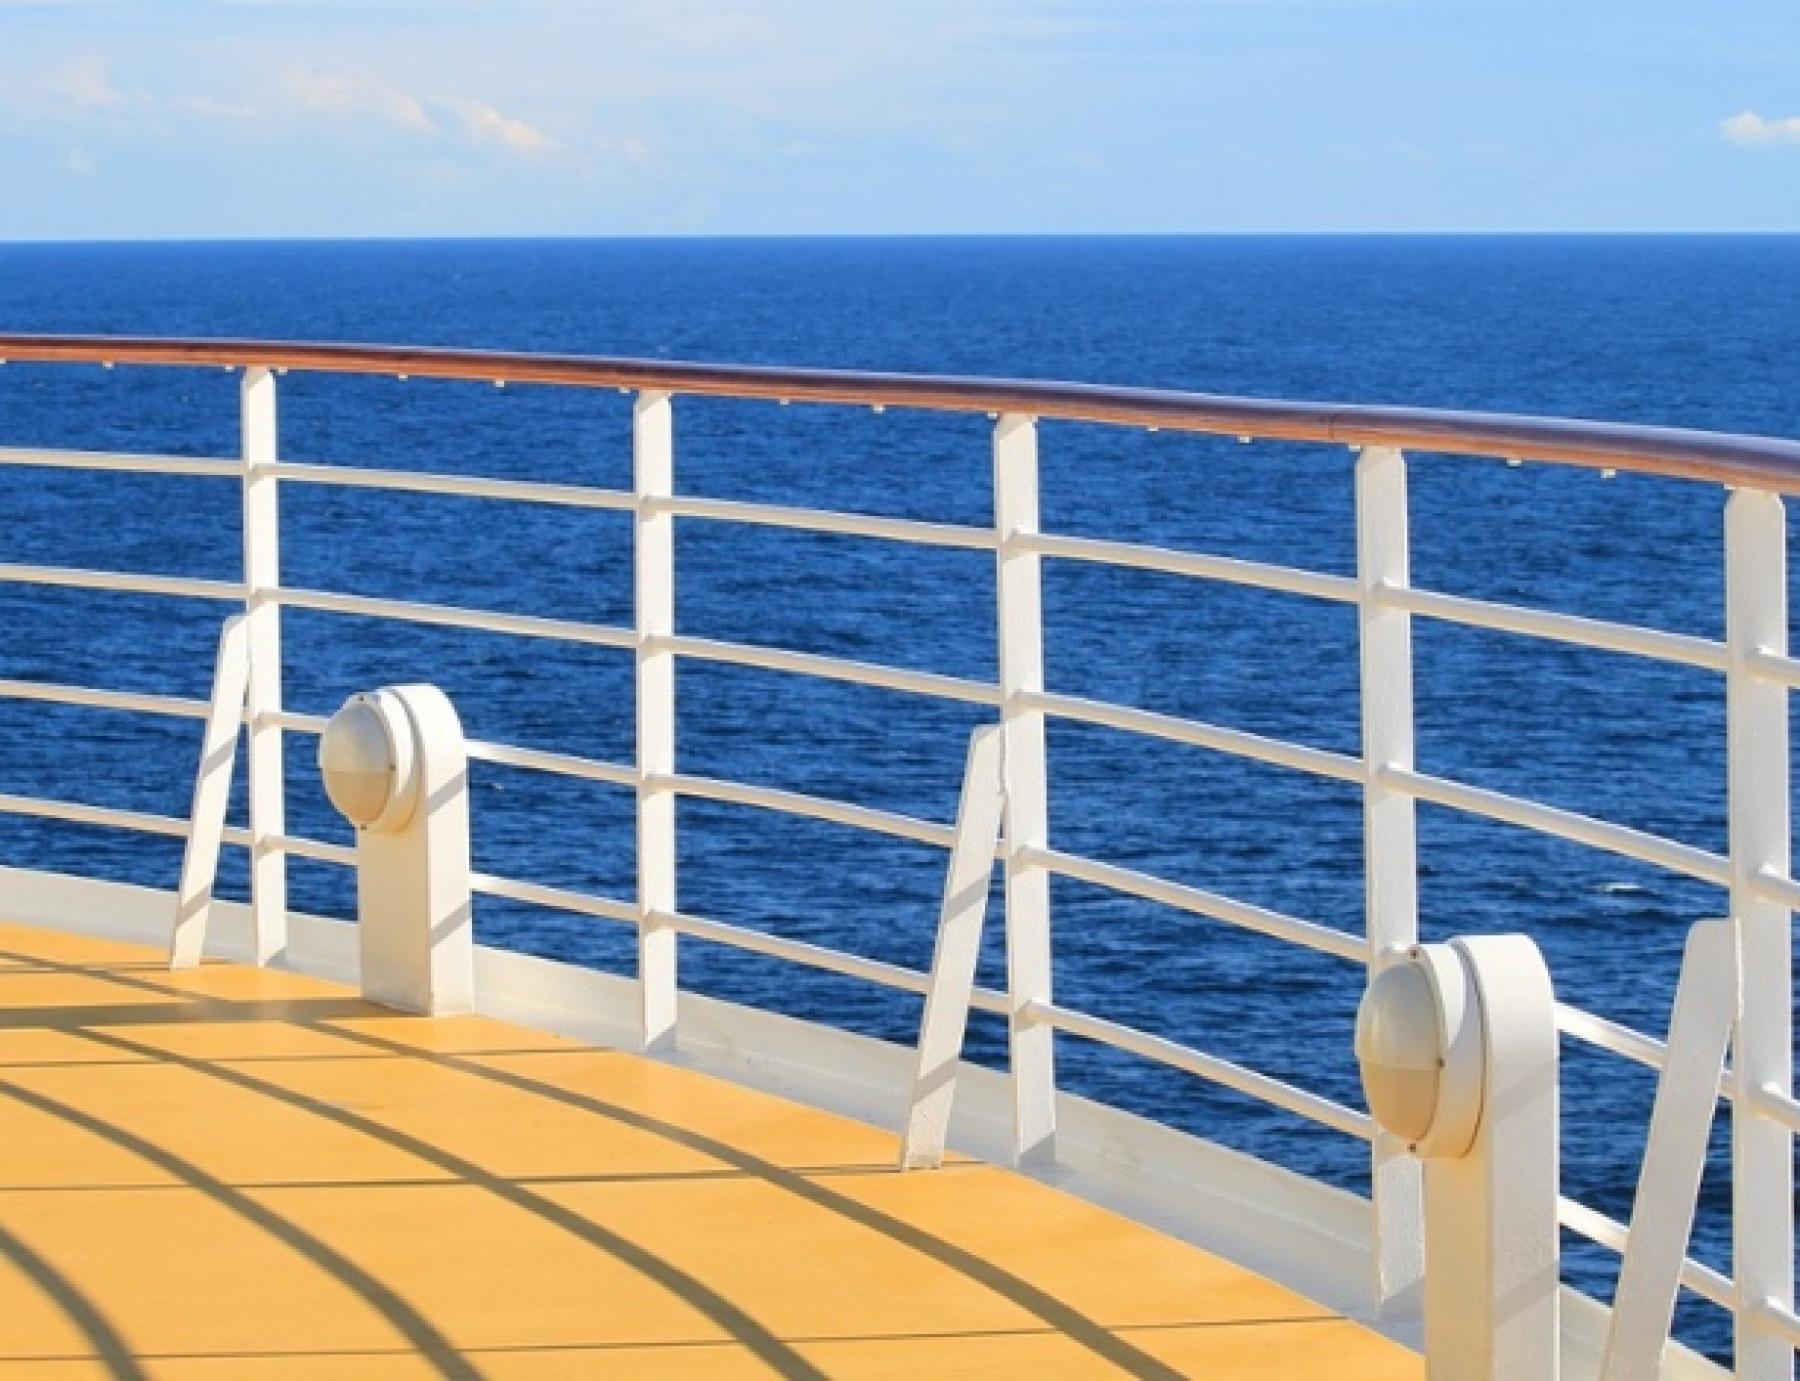 Carnival Cruise Lines Carnival Dream Interiormongolian-wok-3.jpg